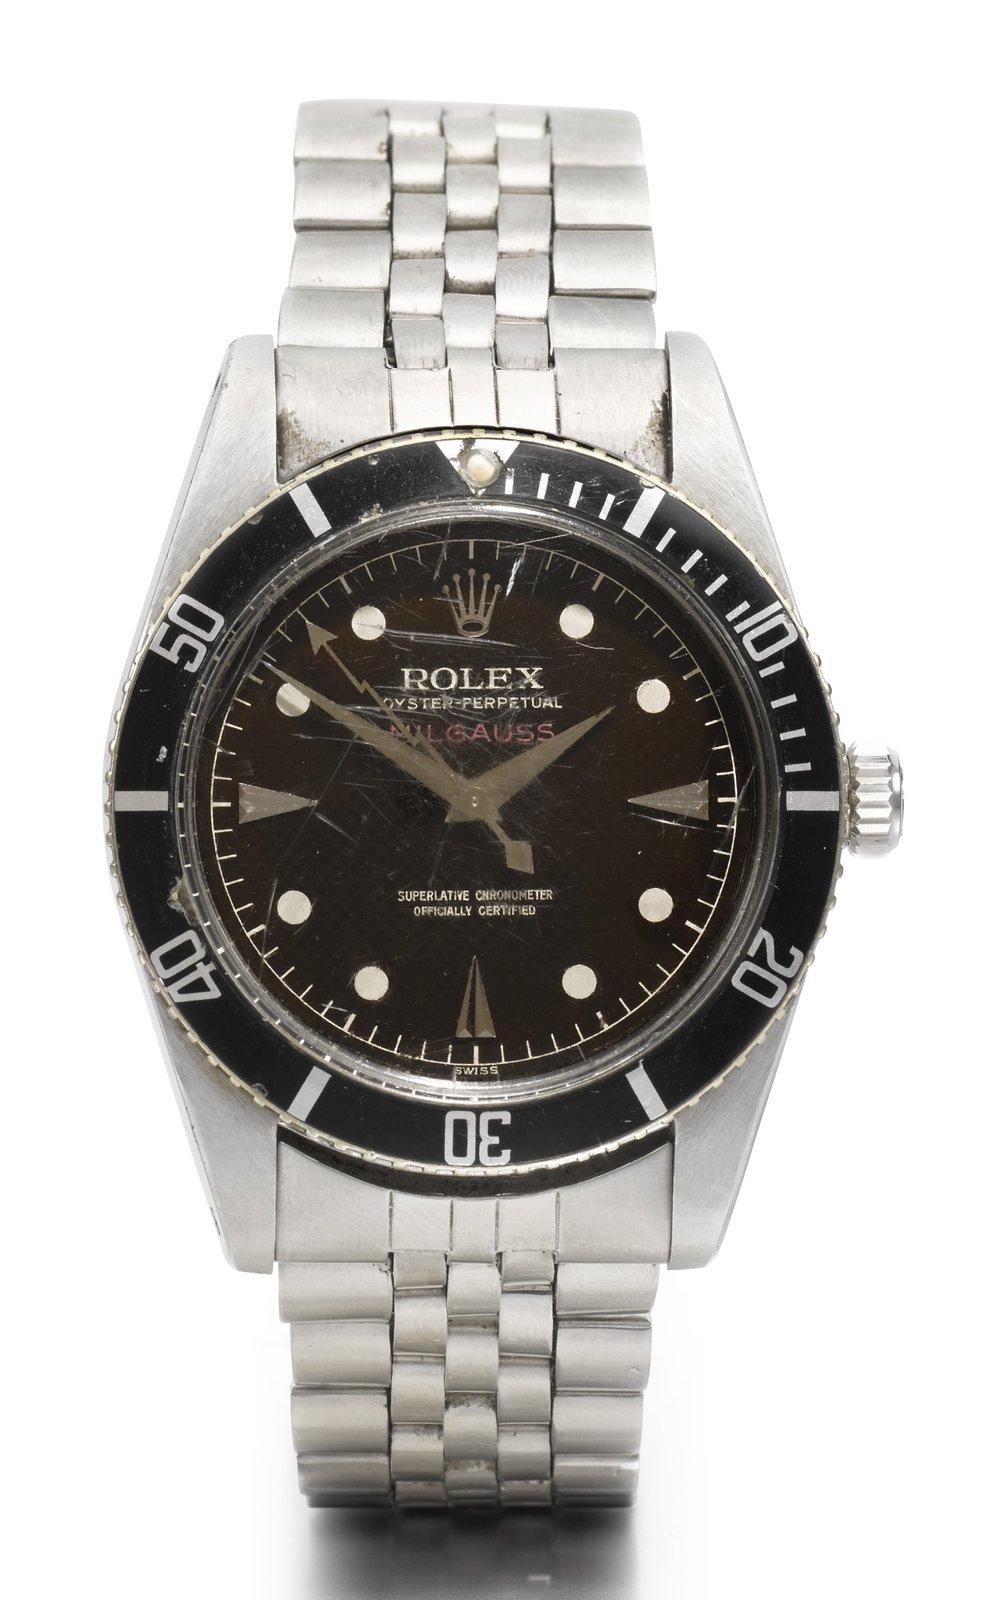 Rolex Milgauss Ref. 6451, circa 1958.